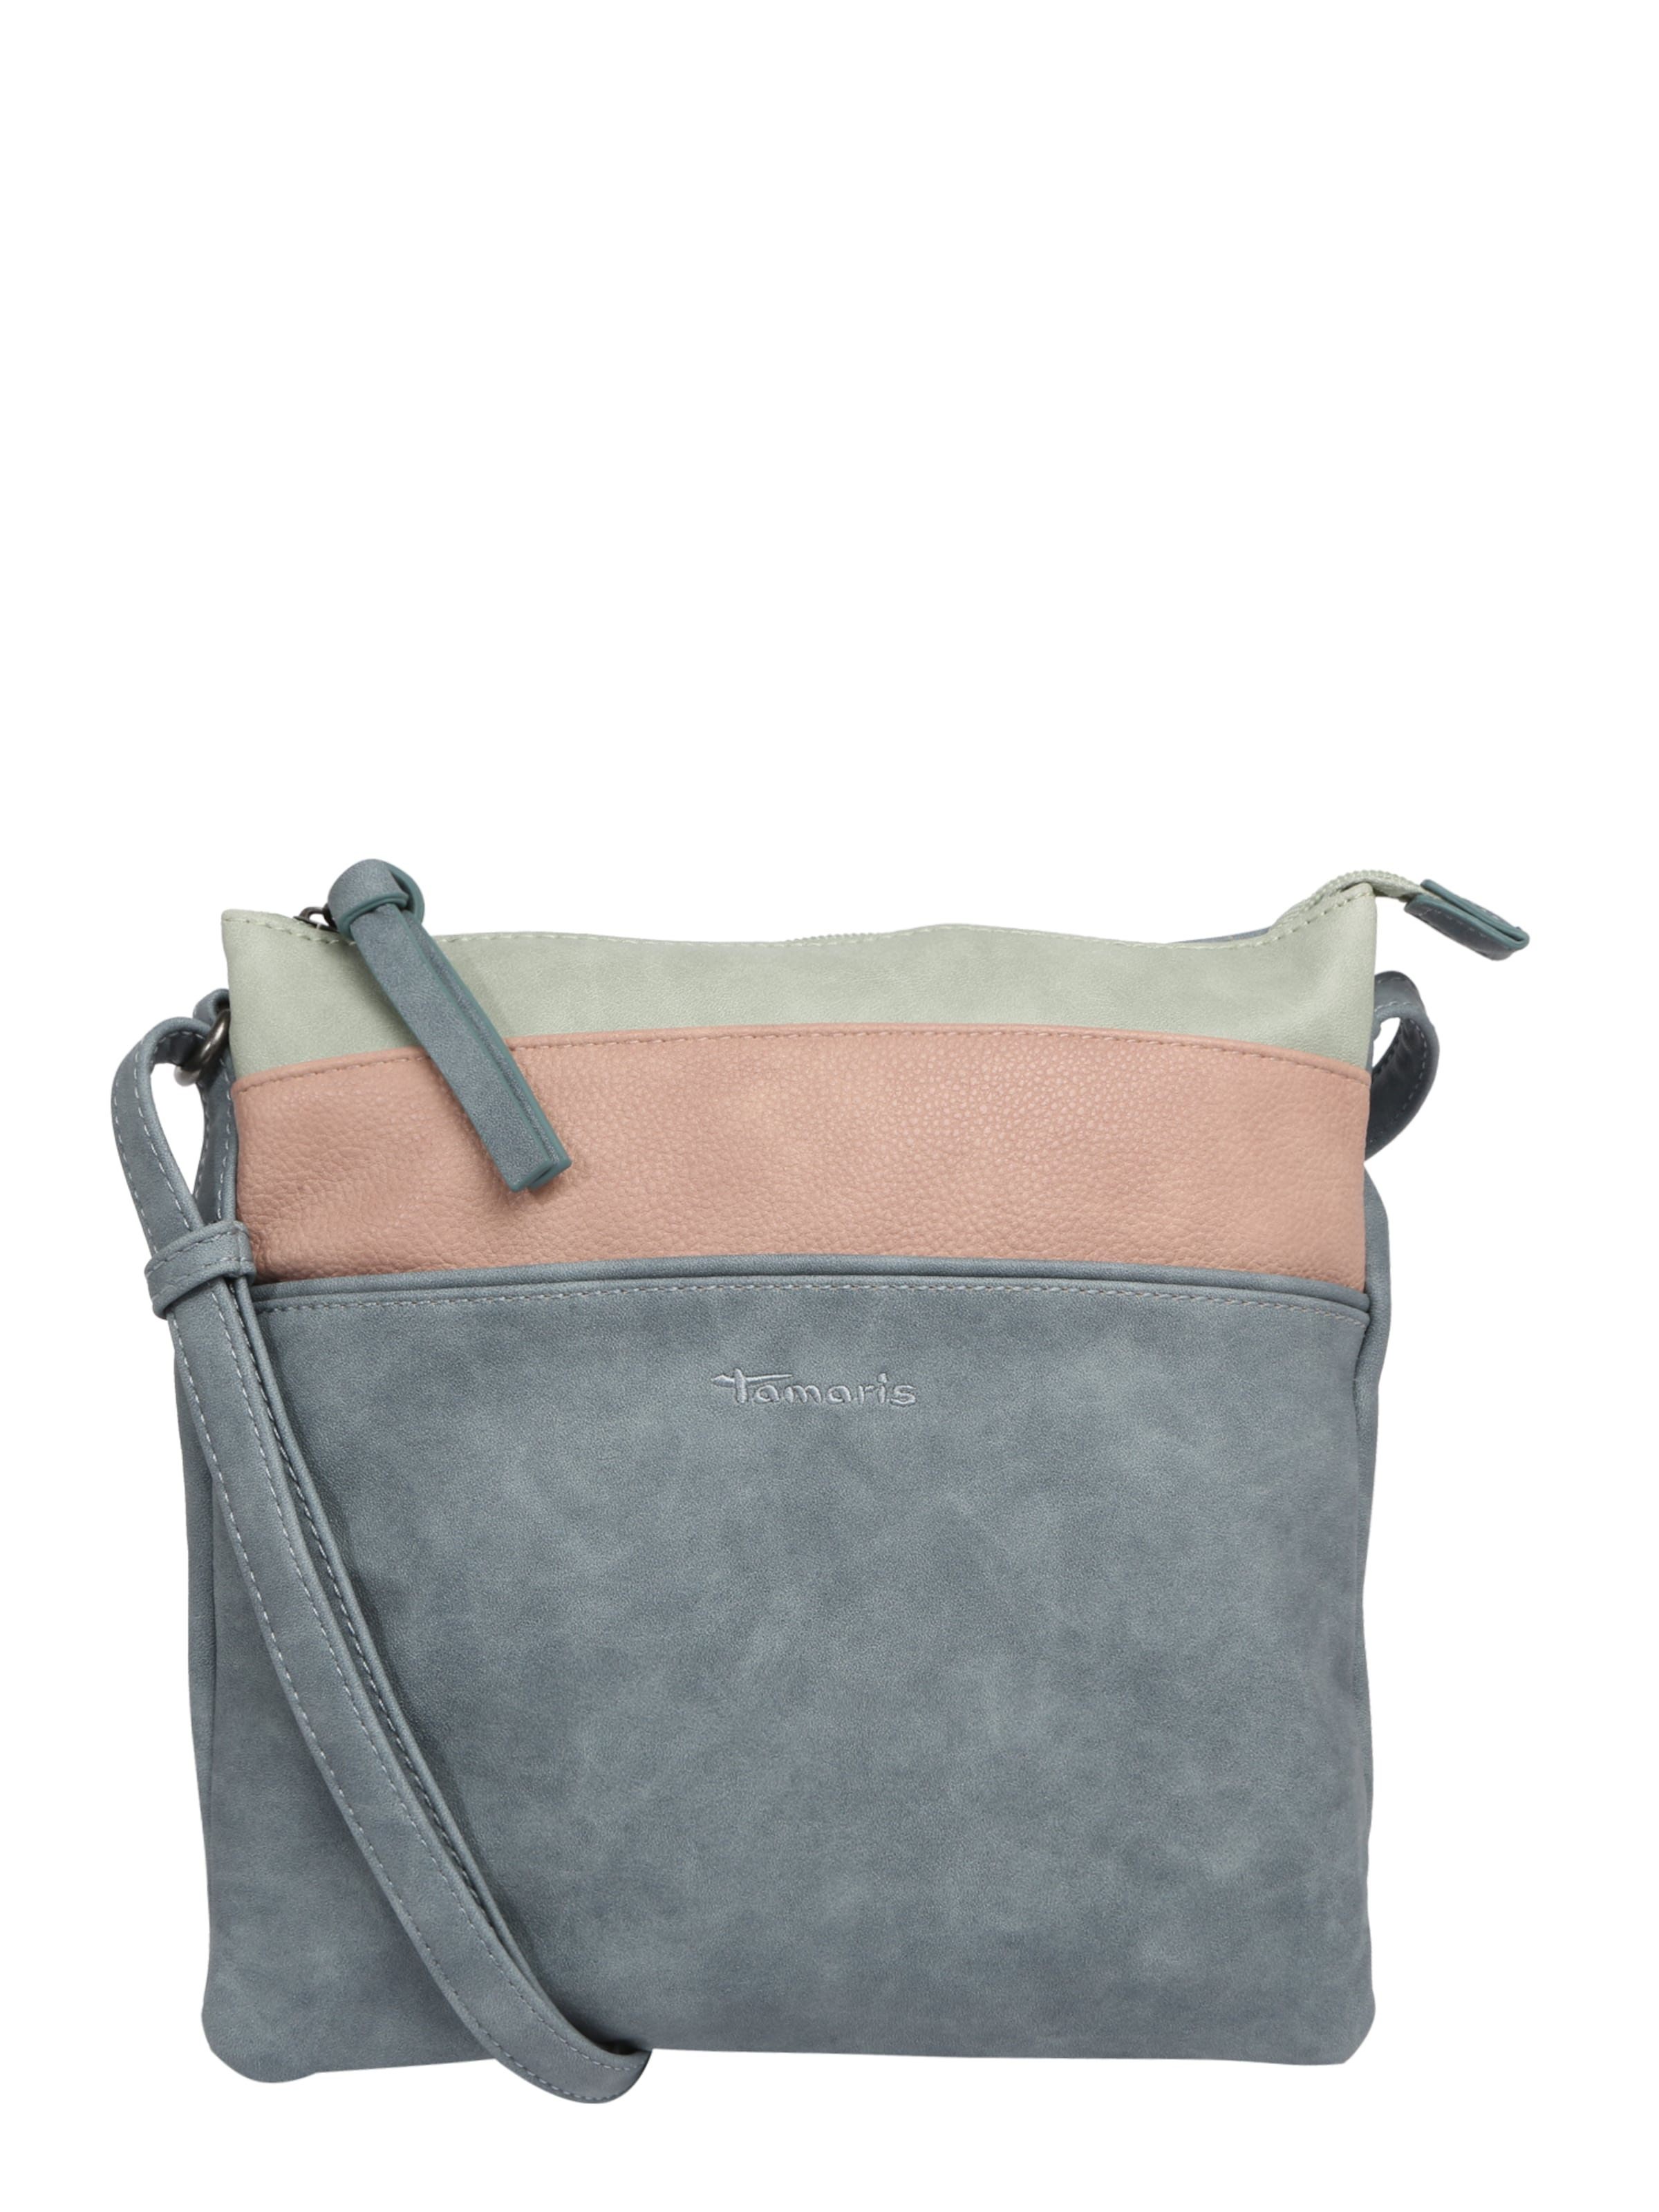 Freies Verschiffen Sehr Billig TAMARIS Crossbody Bag im Colourblocking-Design 'KHEMA' Billigshop Freies Verschiffen Wahl Kaufen Online-Outlet vrXh253b